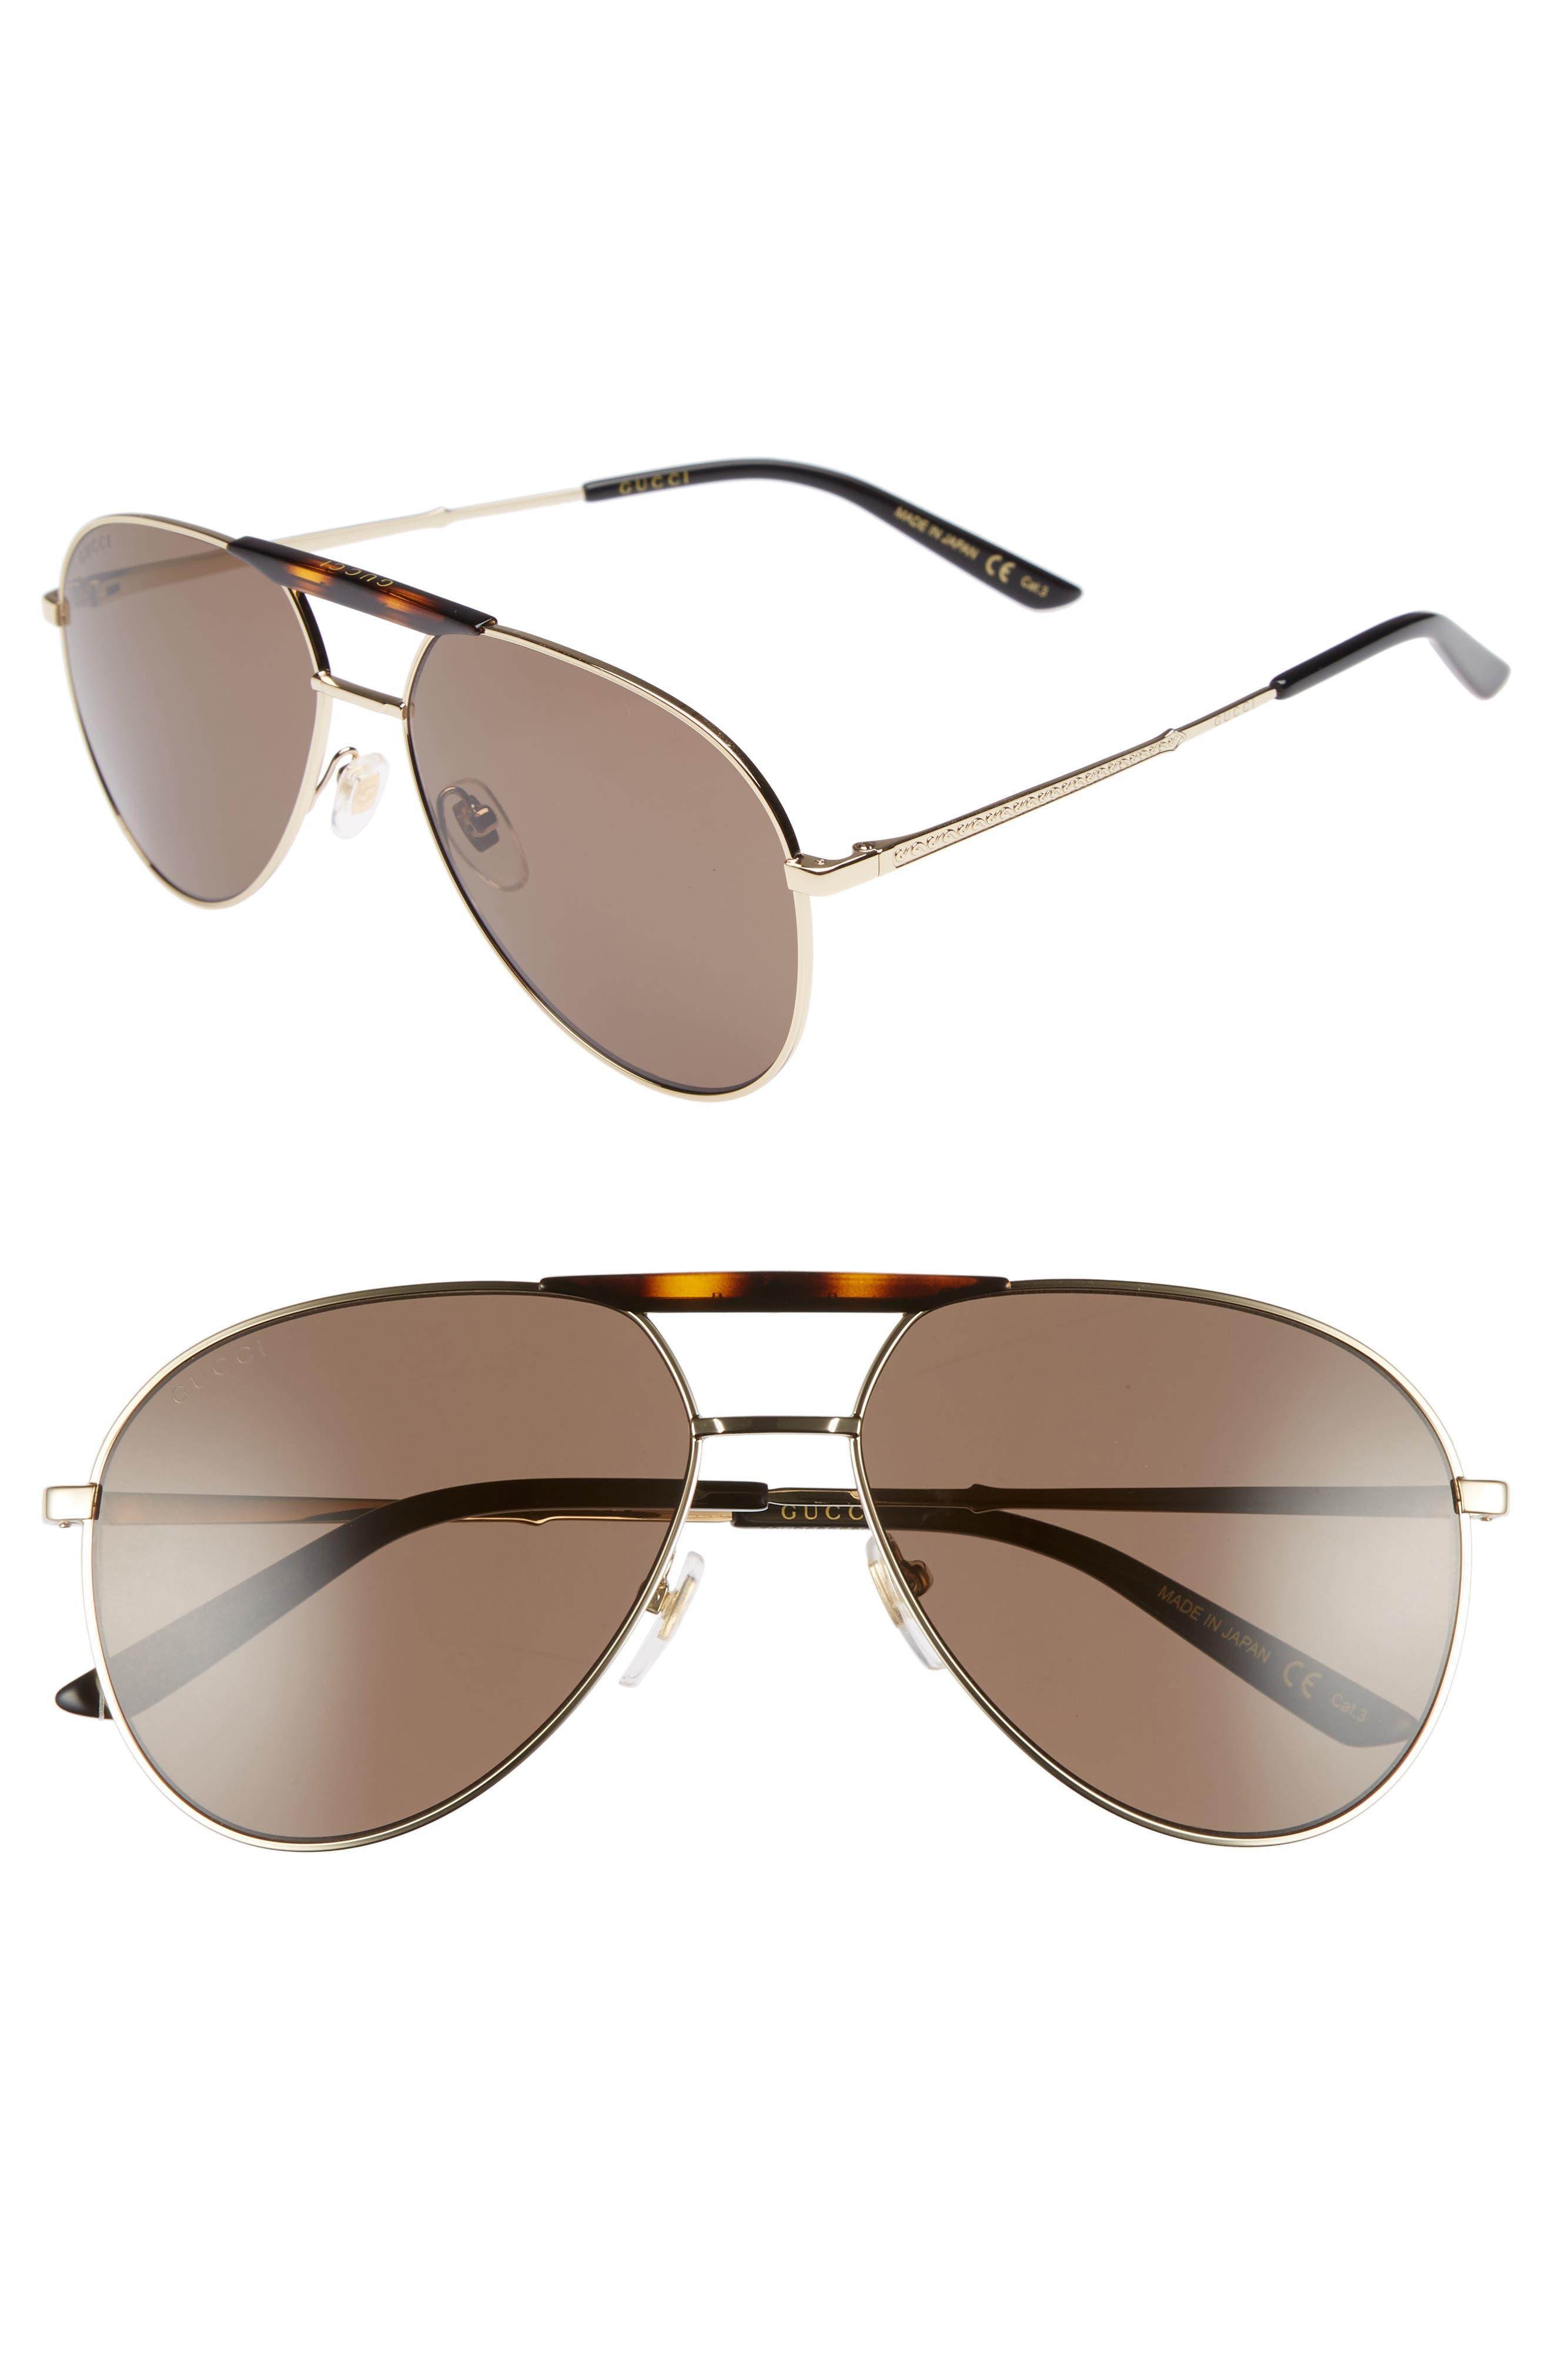 Cruise 59mm Aviator Sunglasses,                         Main,                         color, GOLD/ BLACK